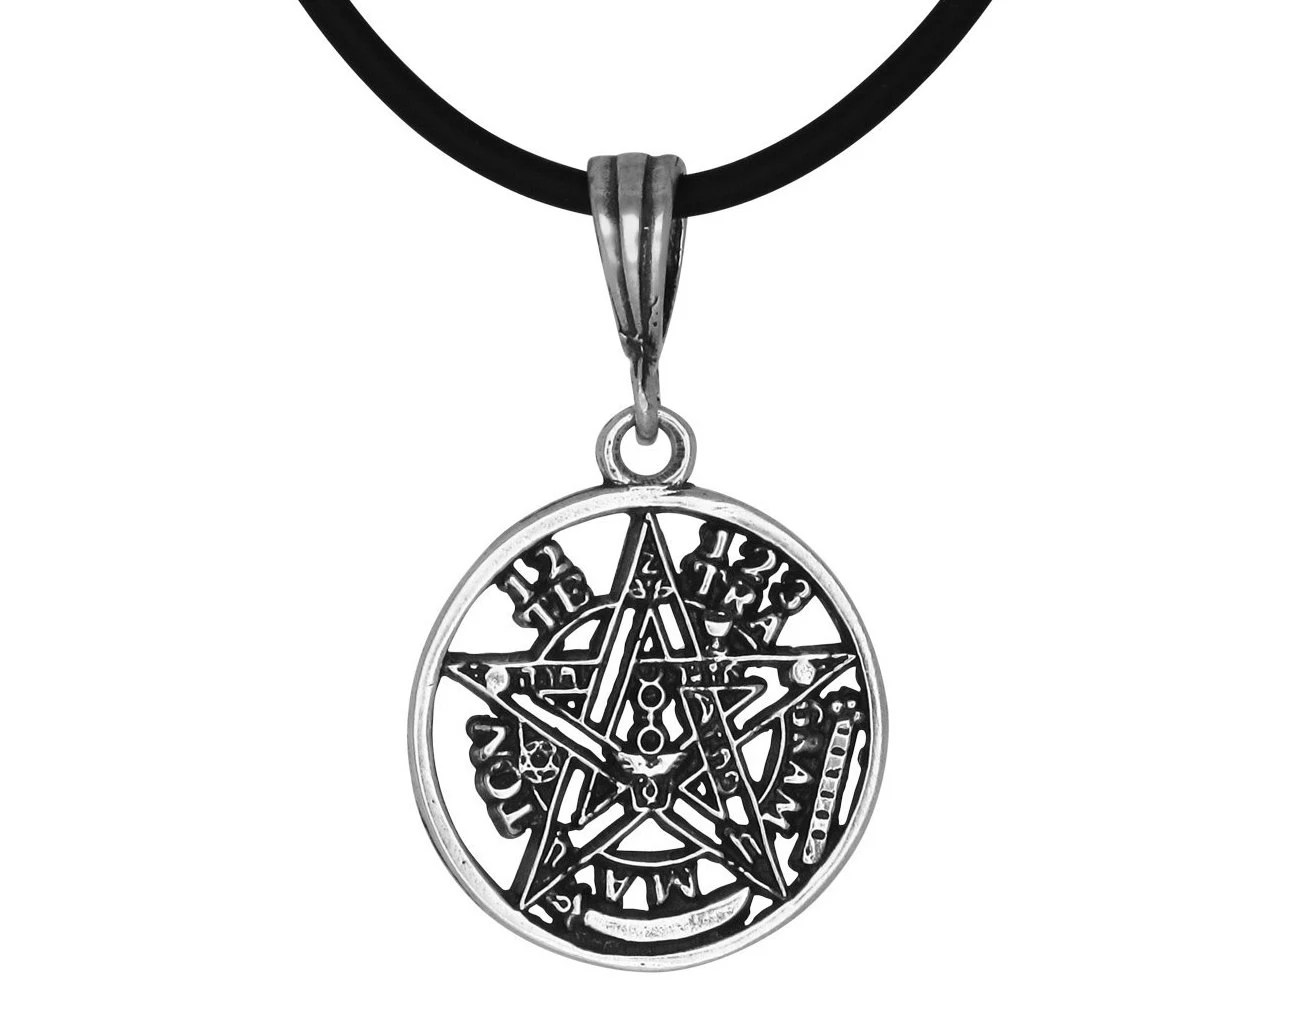 Eliphas Levi Tetragrammaton Pentagram Sterling Silver 925